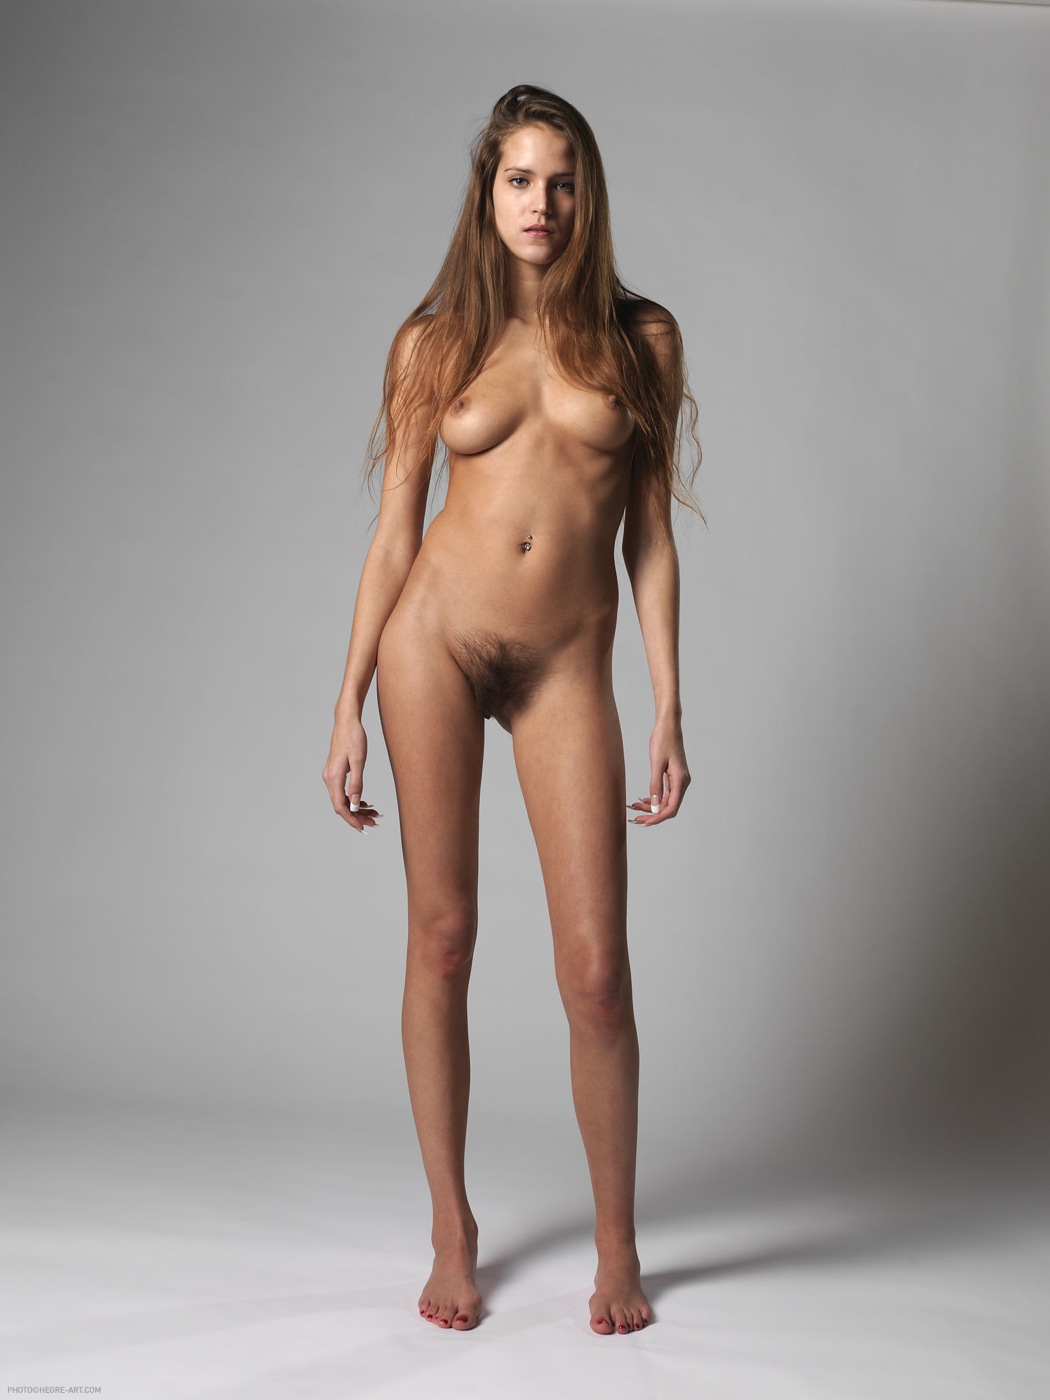 nice nude mom pics